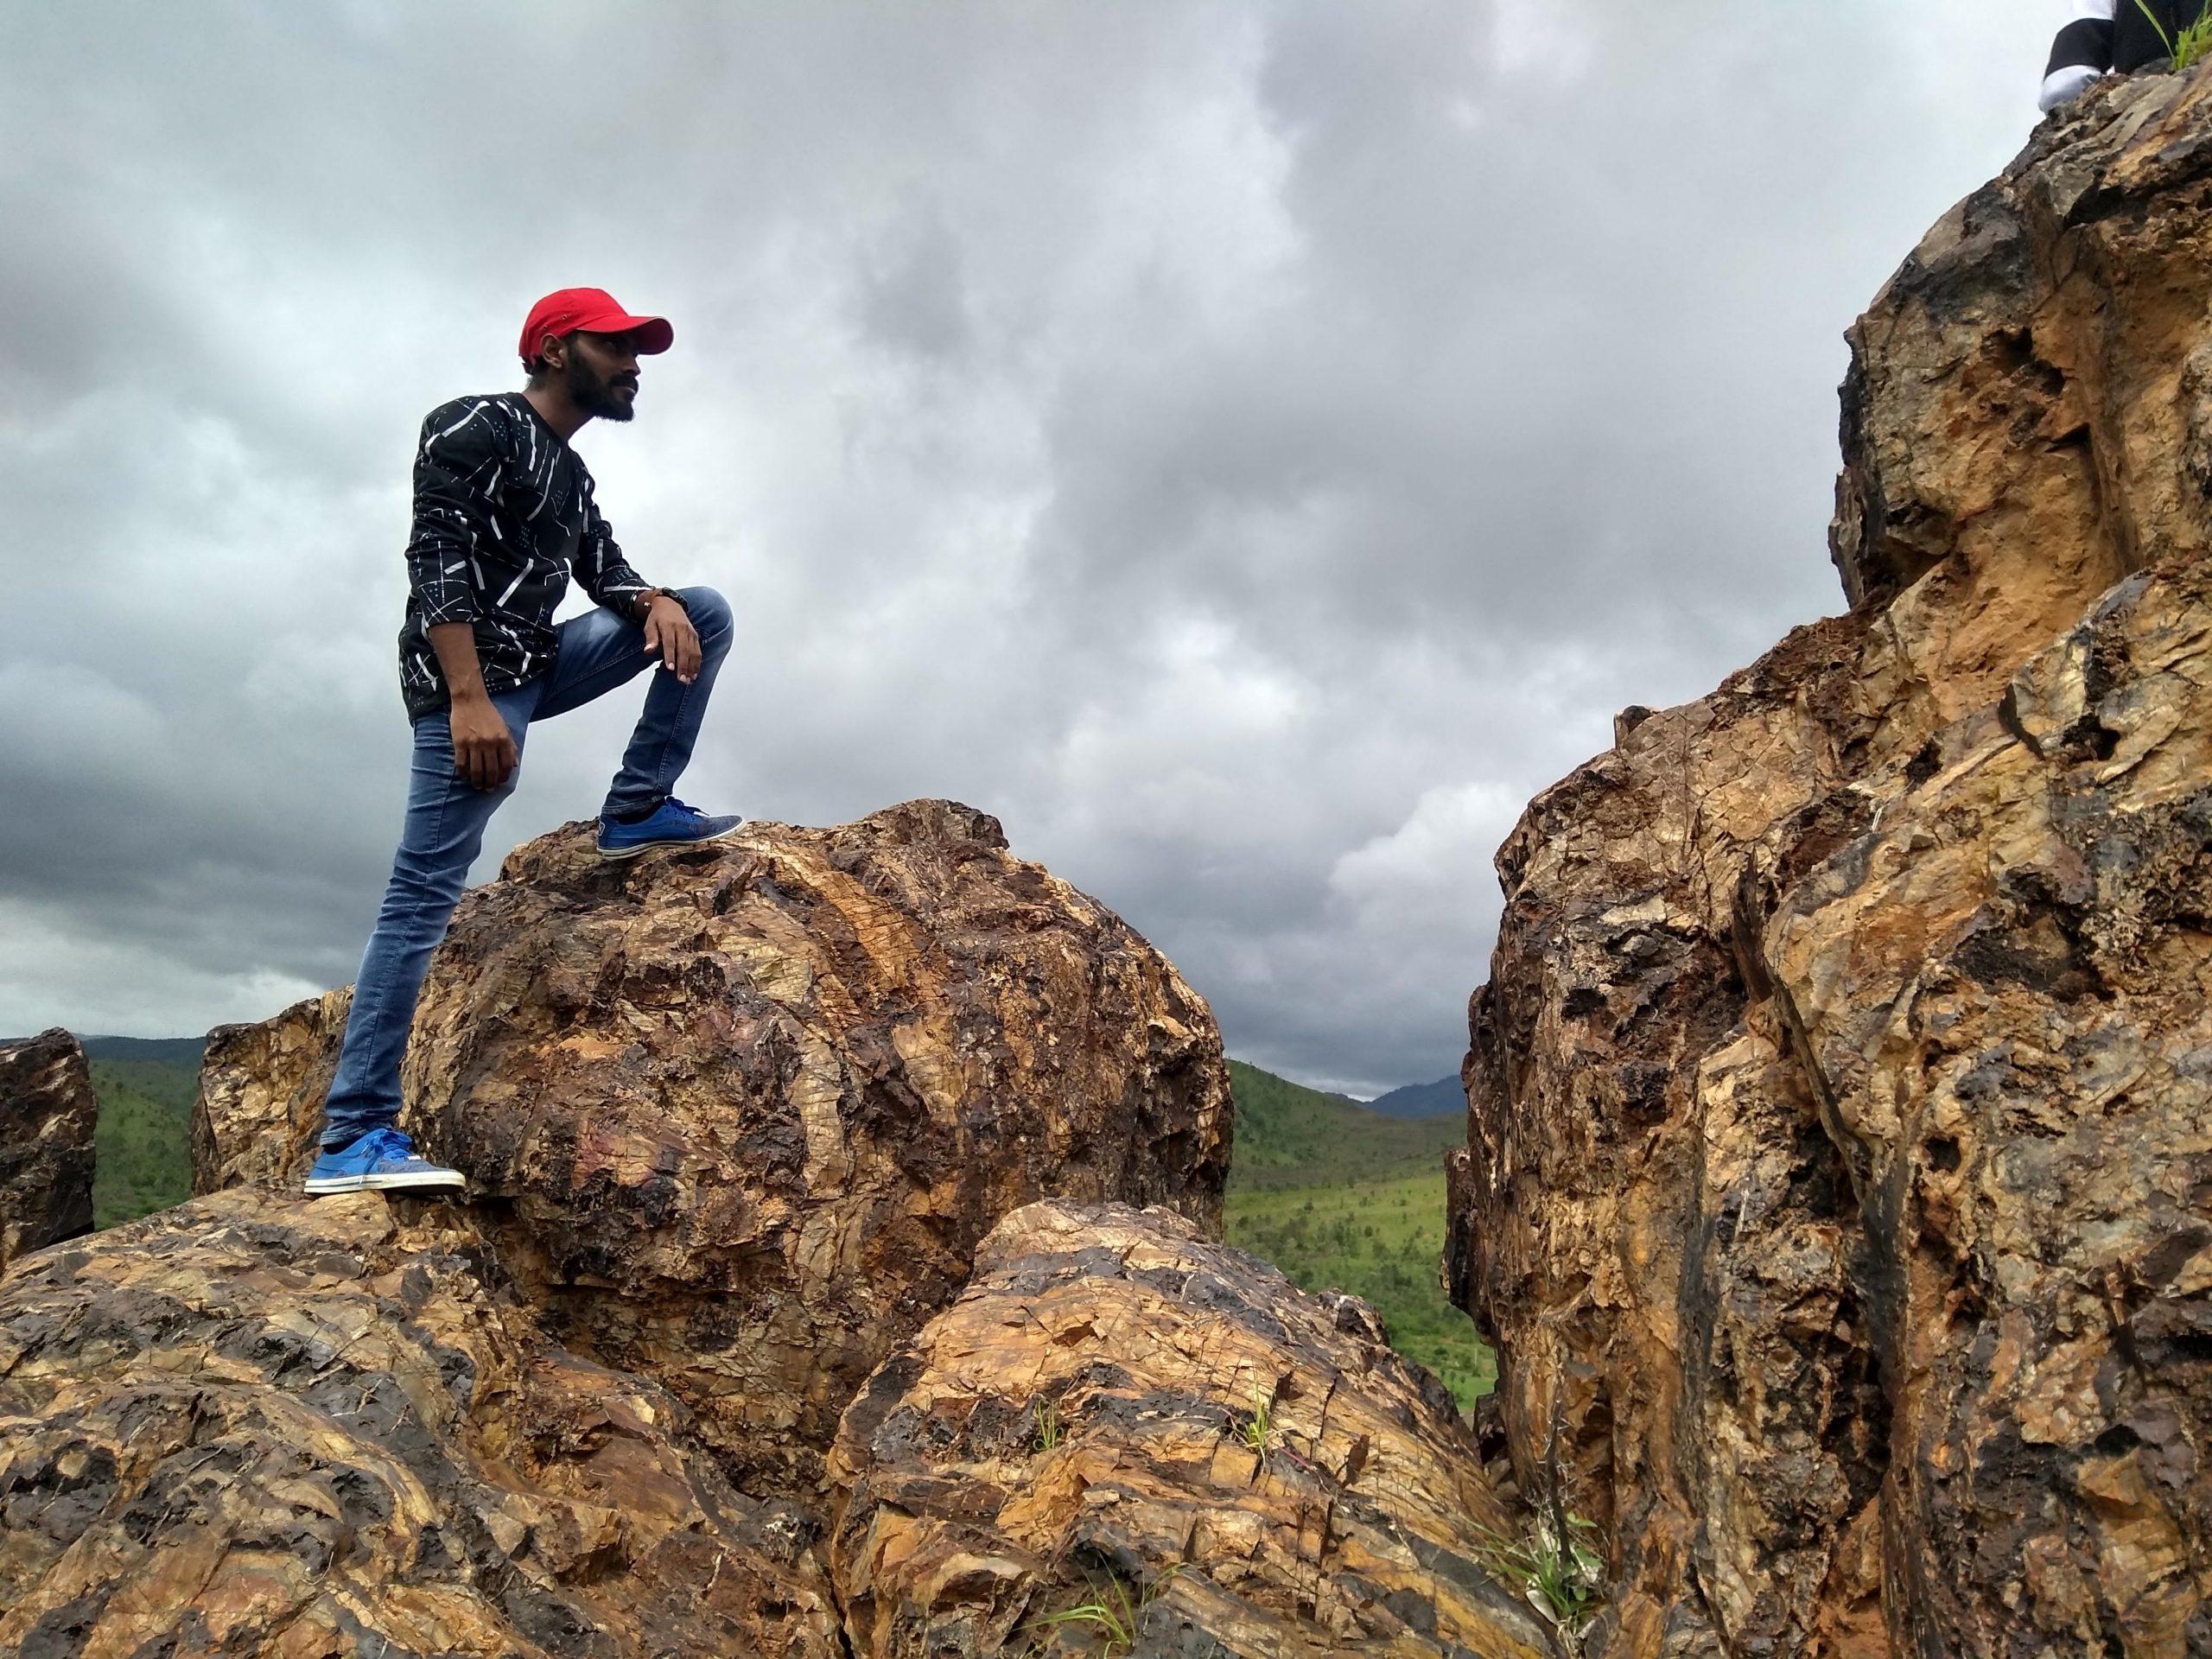 Human standing on rocks